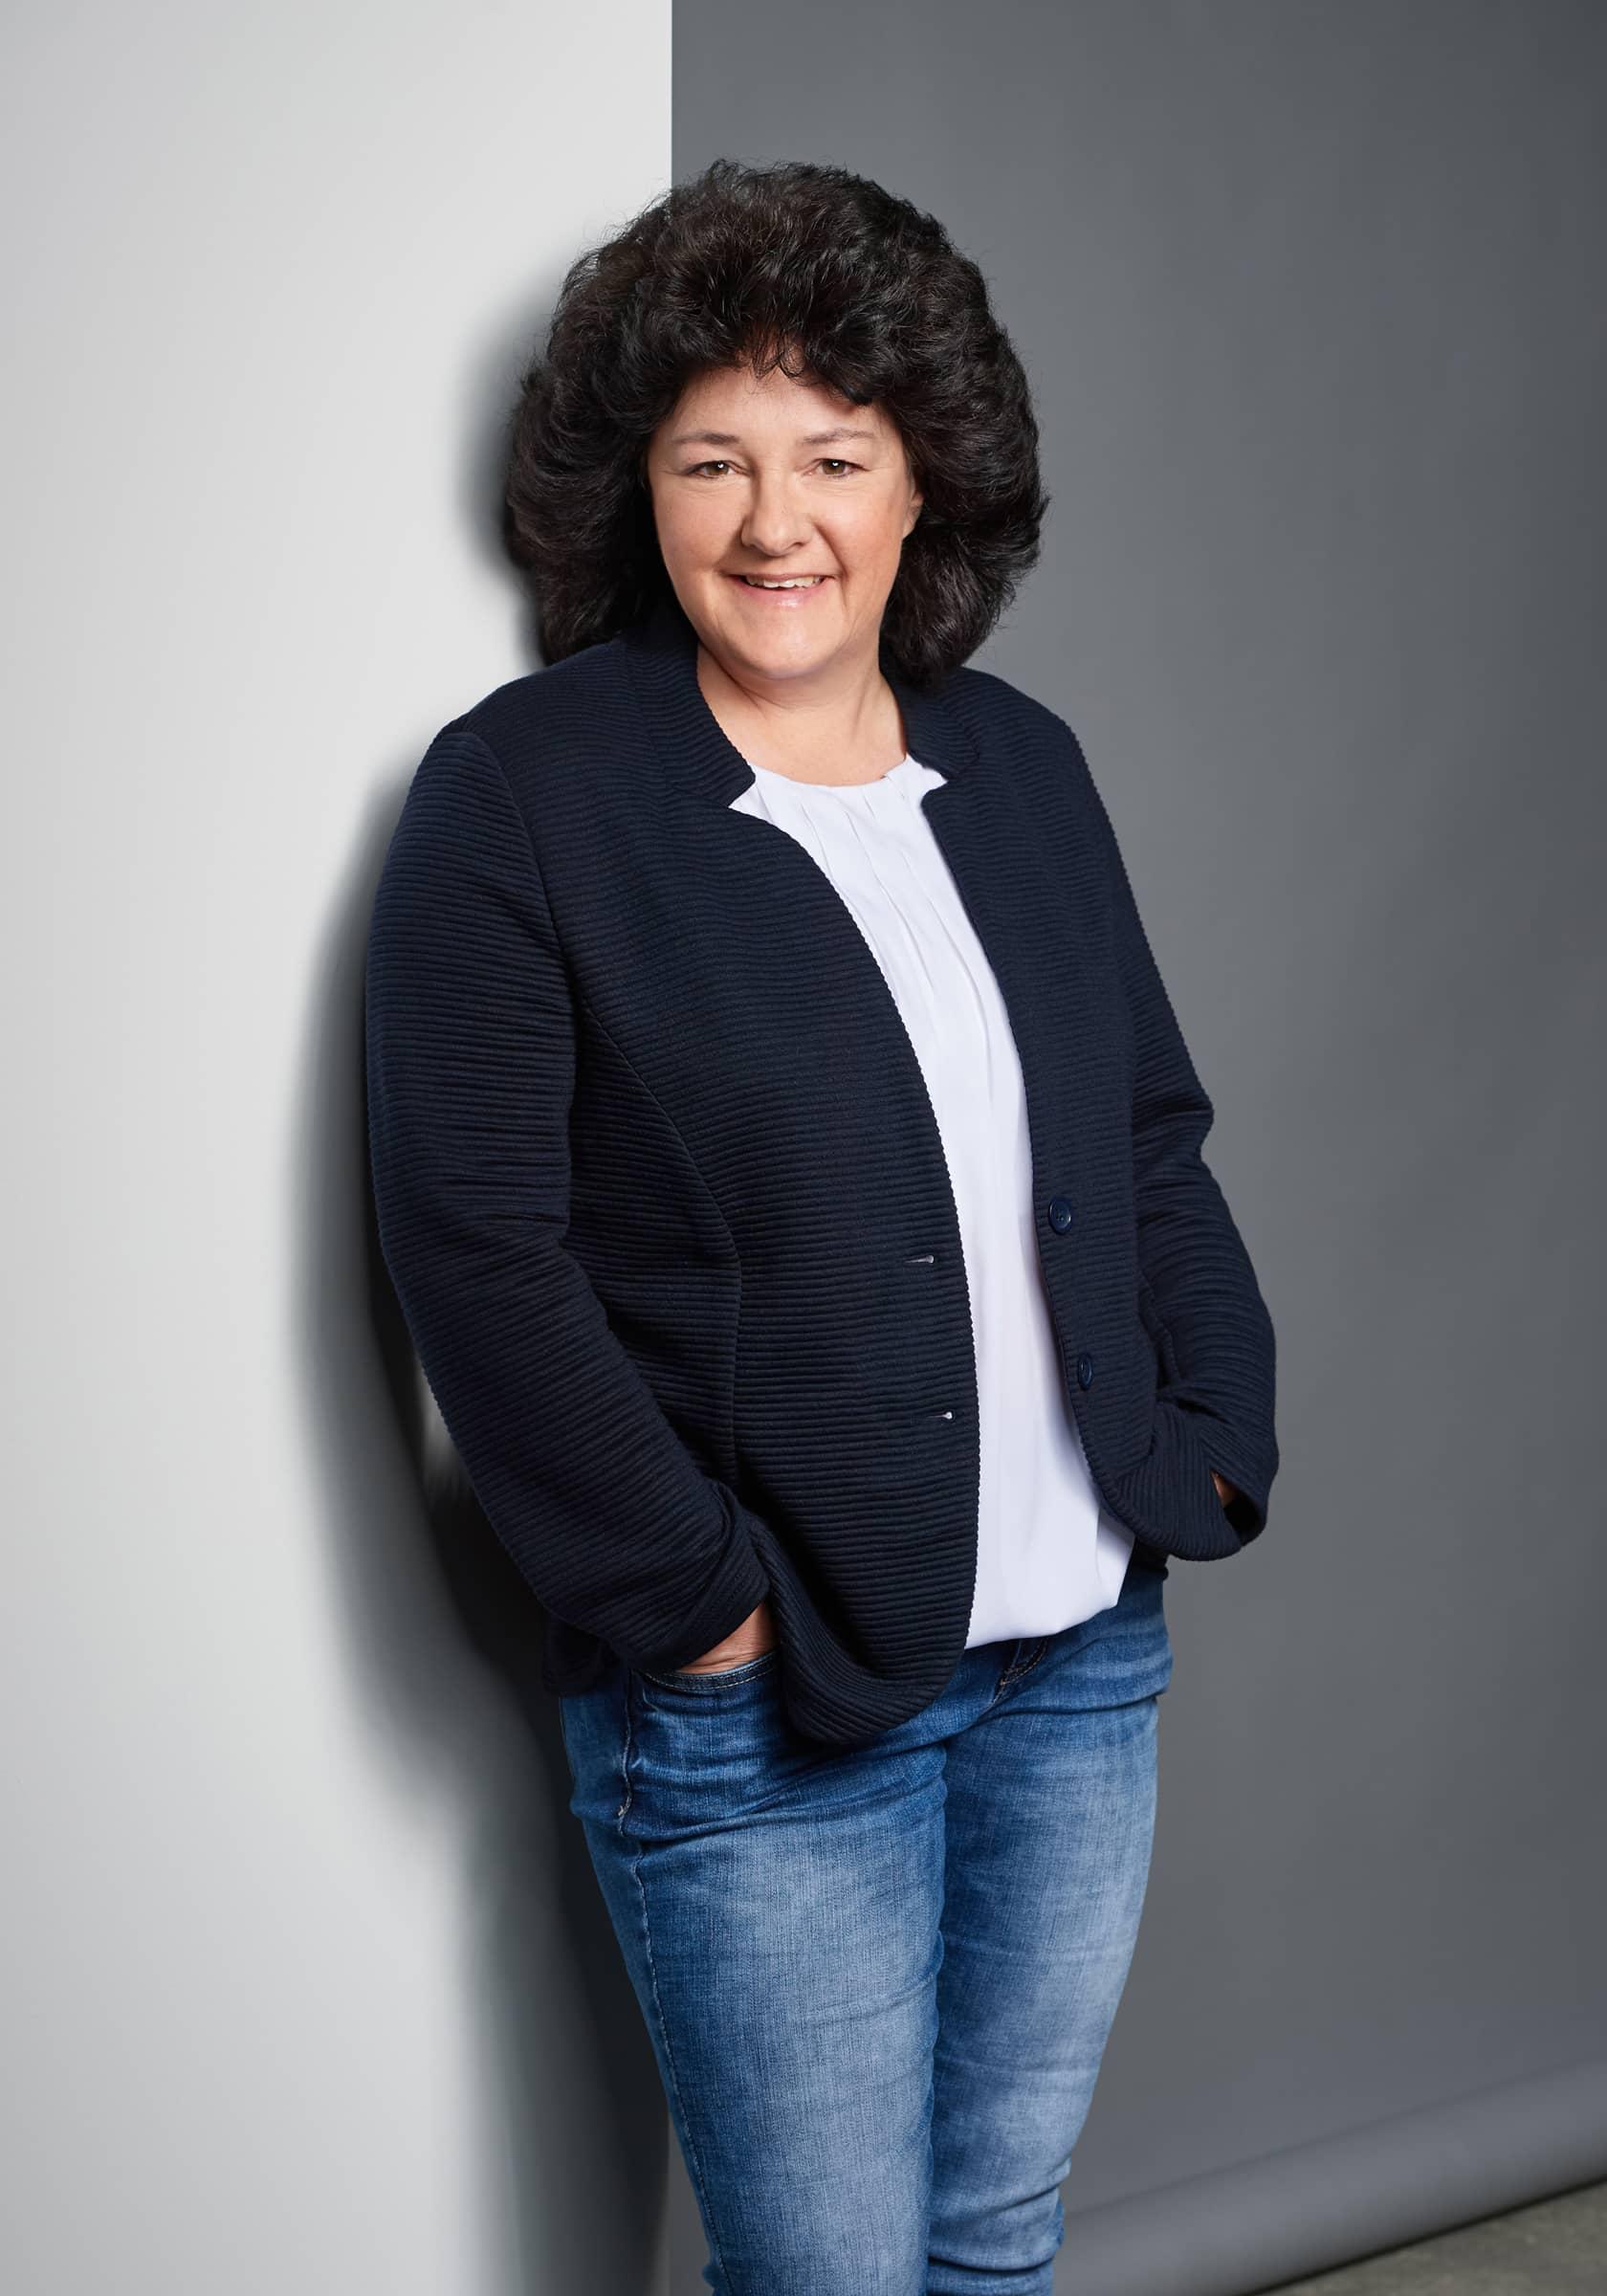 Sabine Hackemann